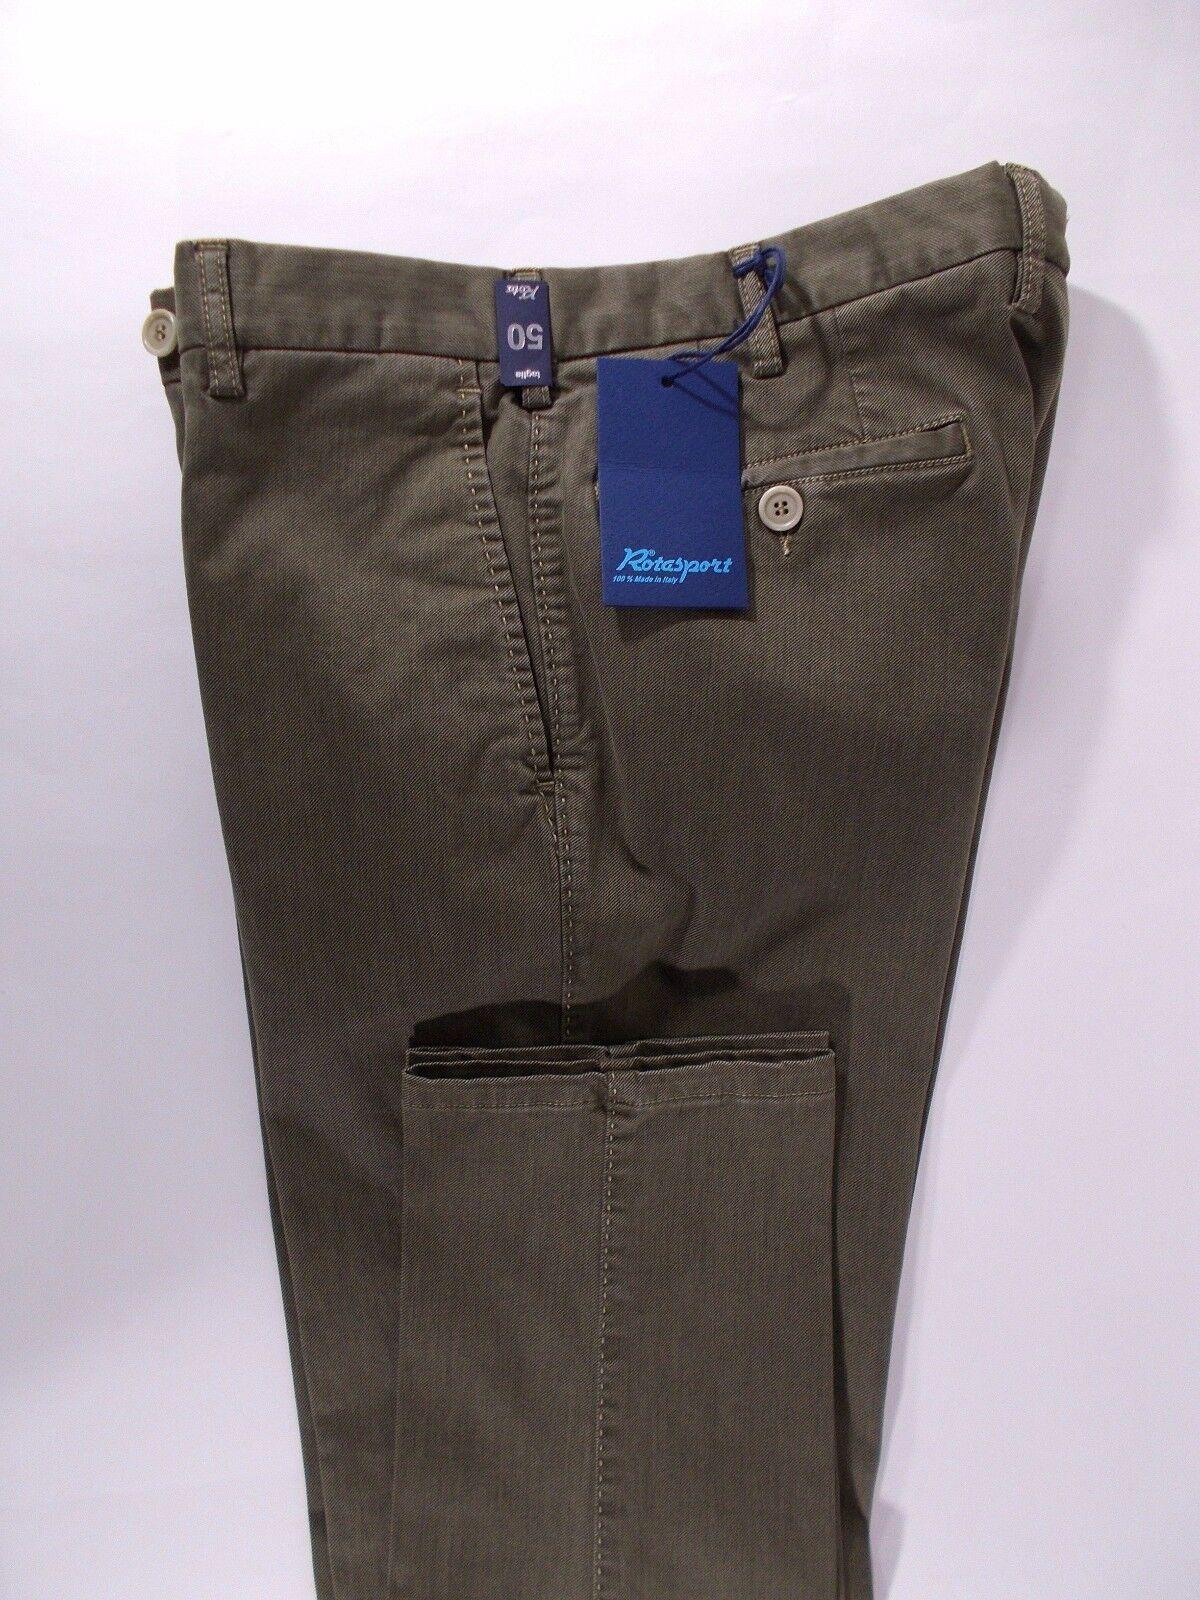 ROTA pantalone uomo uomo uomo SPORTIVO cotone comfort FUSTAGNO verde A I tg. 52-58-62(IT) bfac90